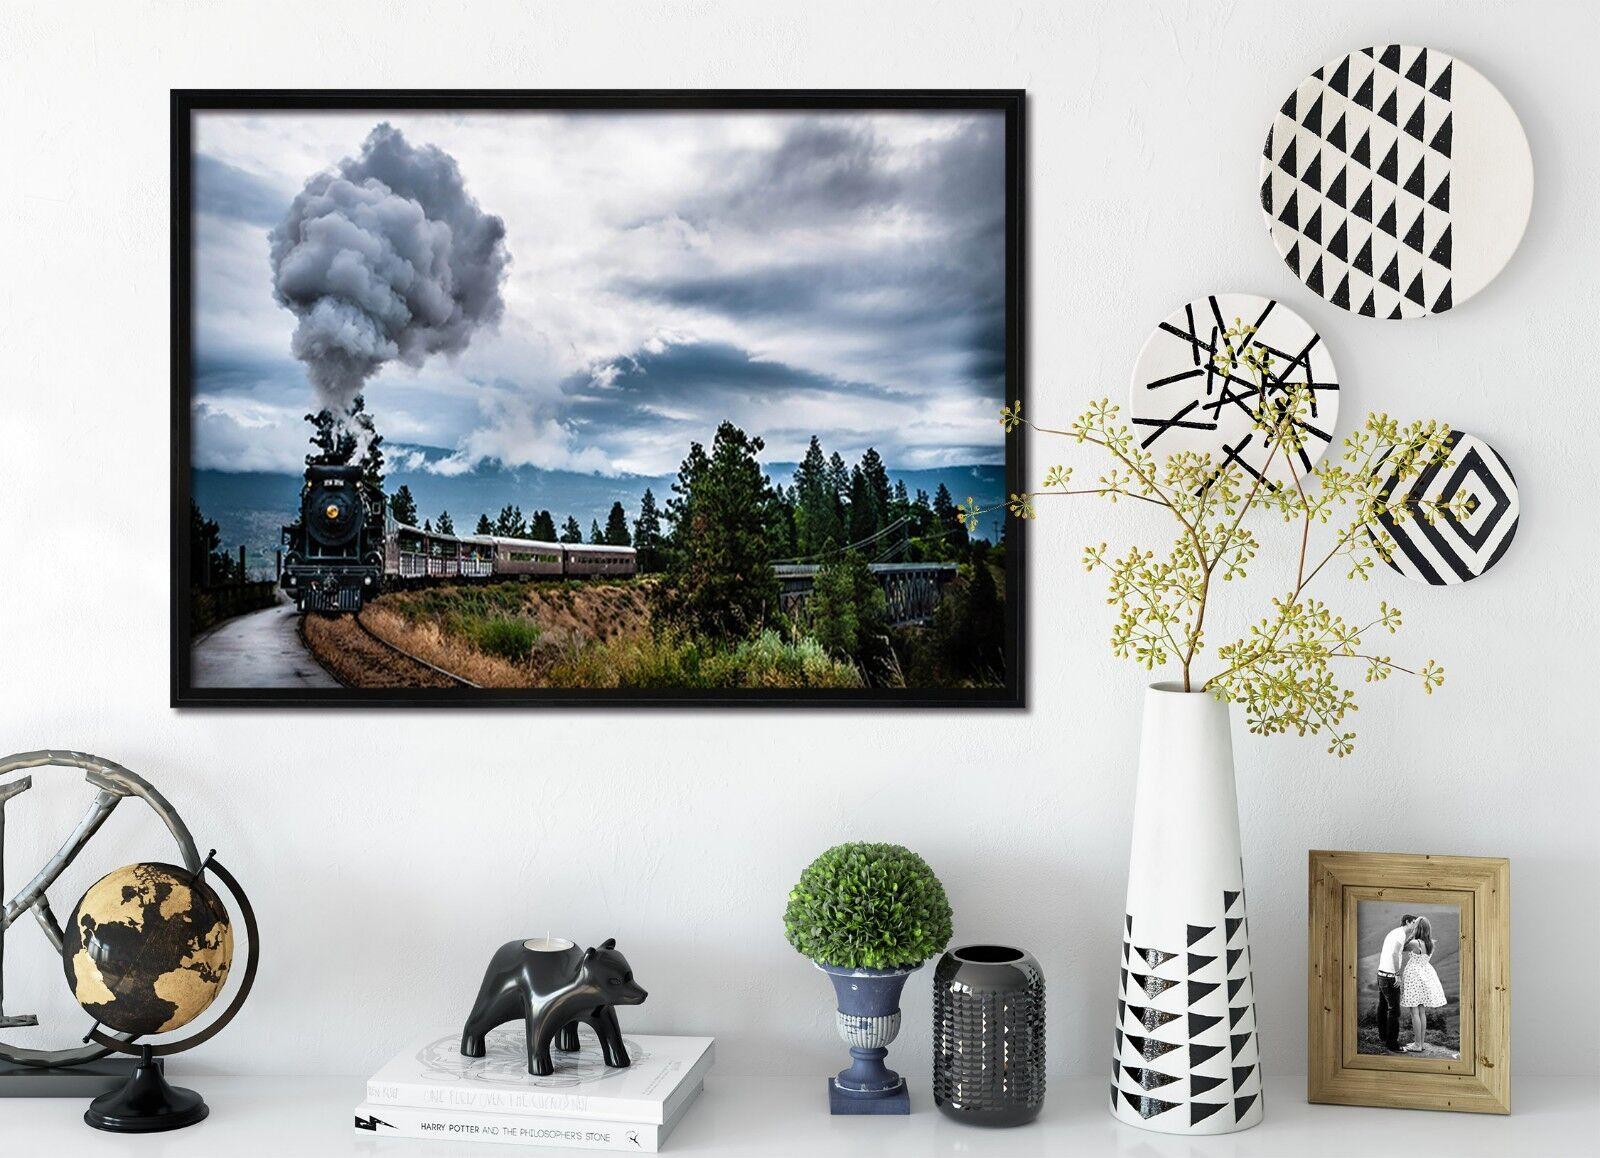 3D Train Smoke Forest 1 Framed Poster Home Decor Print Painting Art AJ WALLPAPER